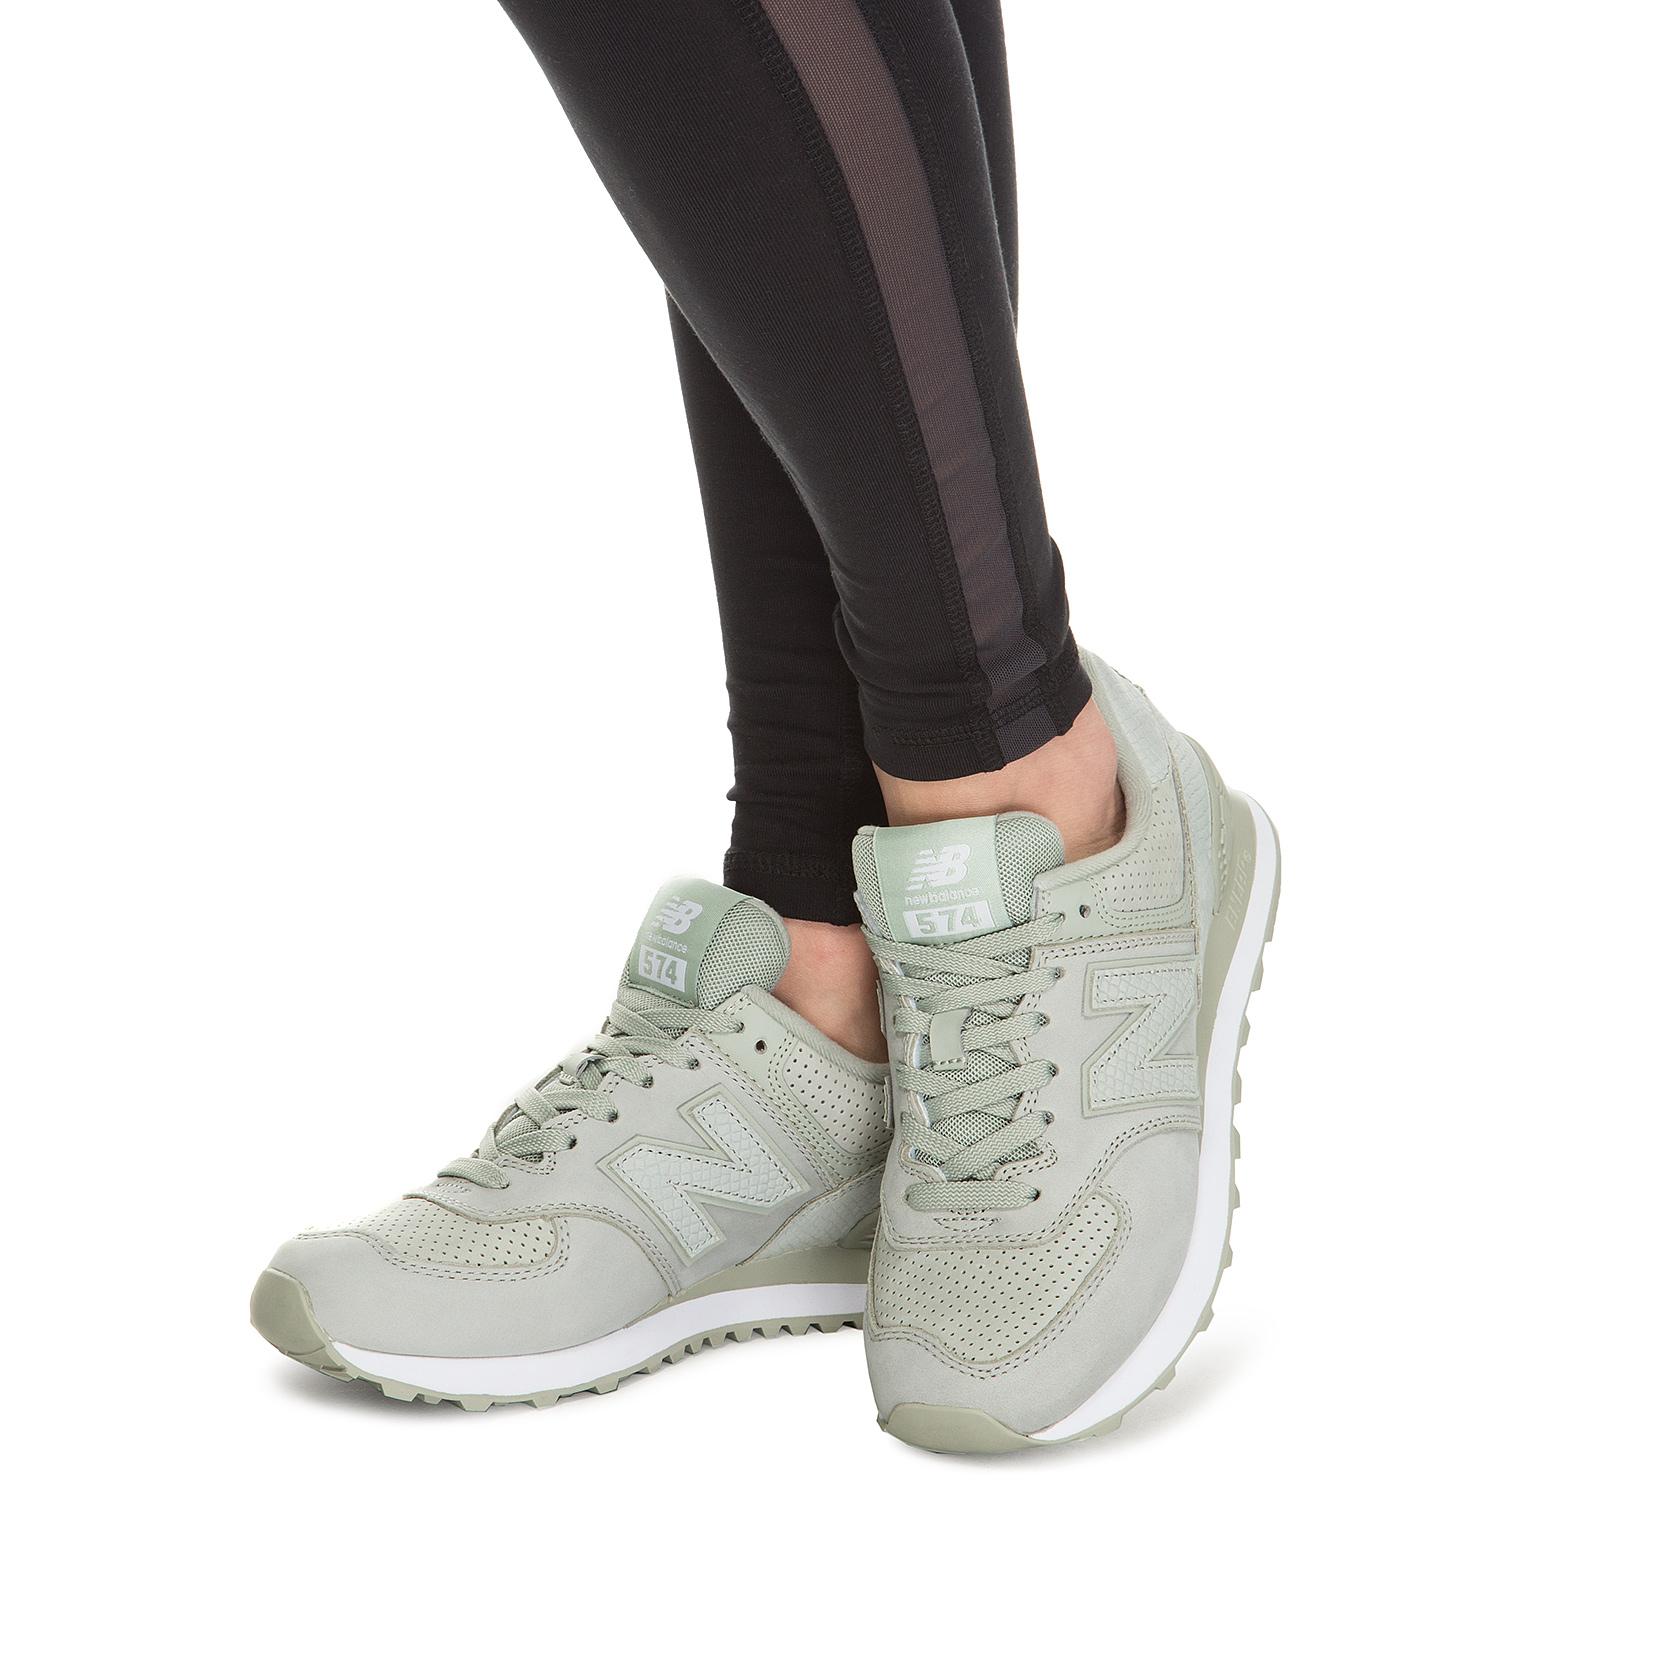 Жіноче взуття повсякденне New Balance 574 Serpent Luxe WL574URV | New Balance